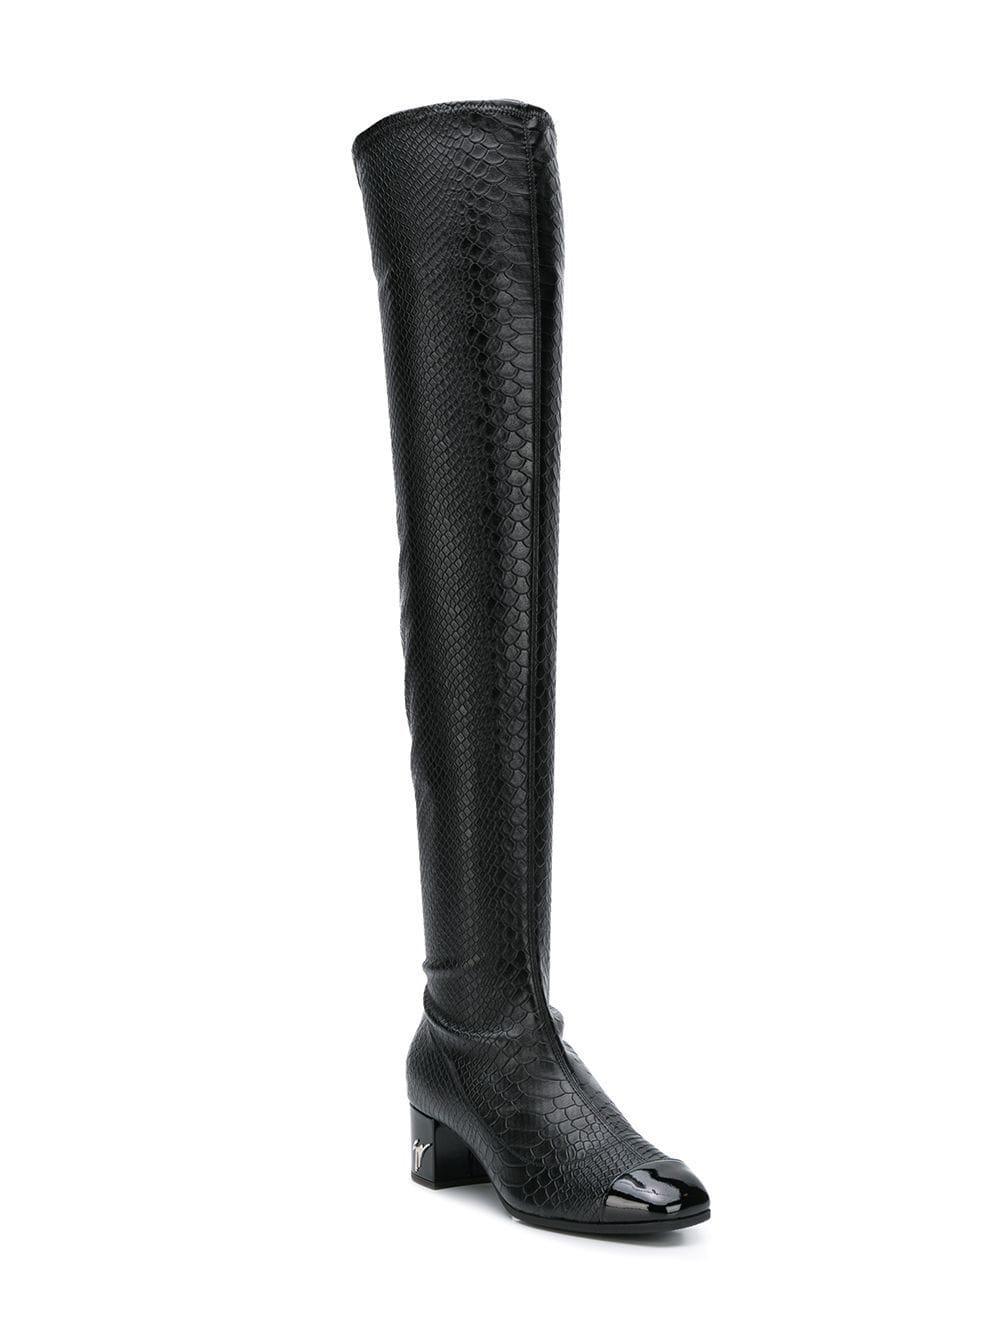 1eaeb0049aaab Giuseppe Zanotti Snakeskin Effect Over The Knee Boots in Black - Lyst